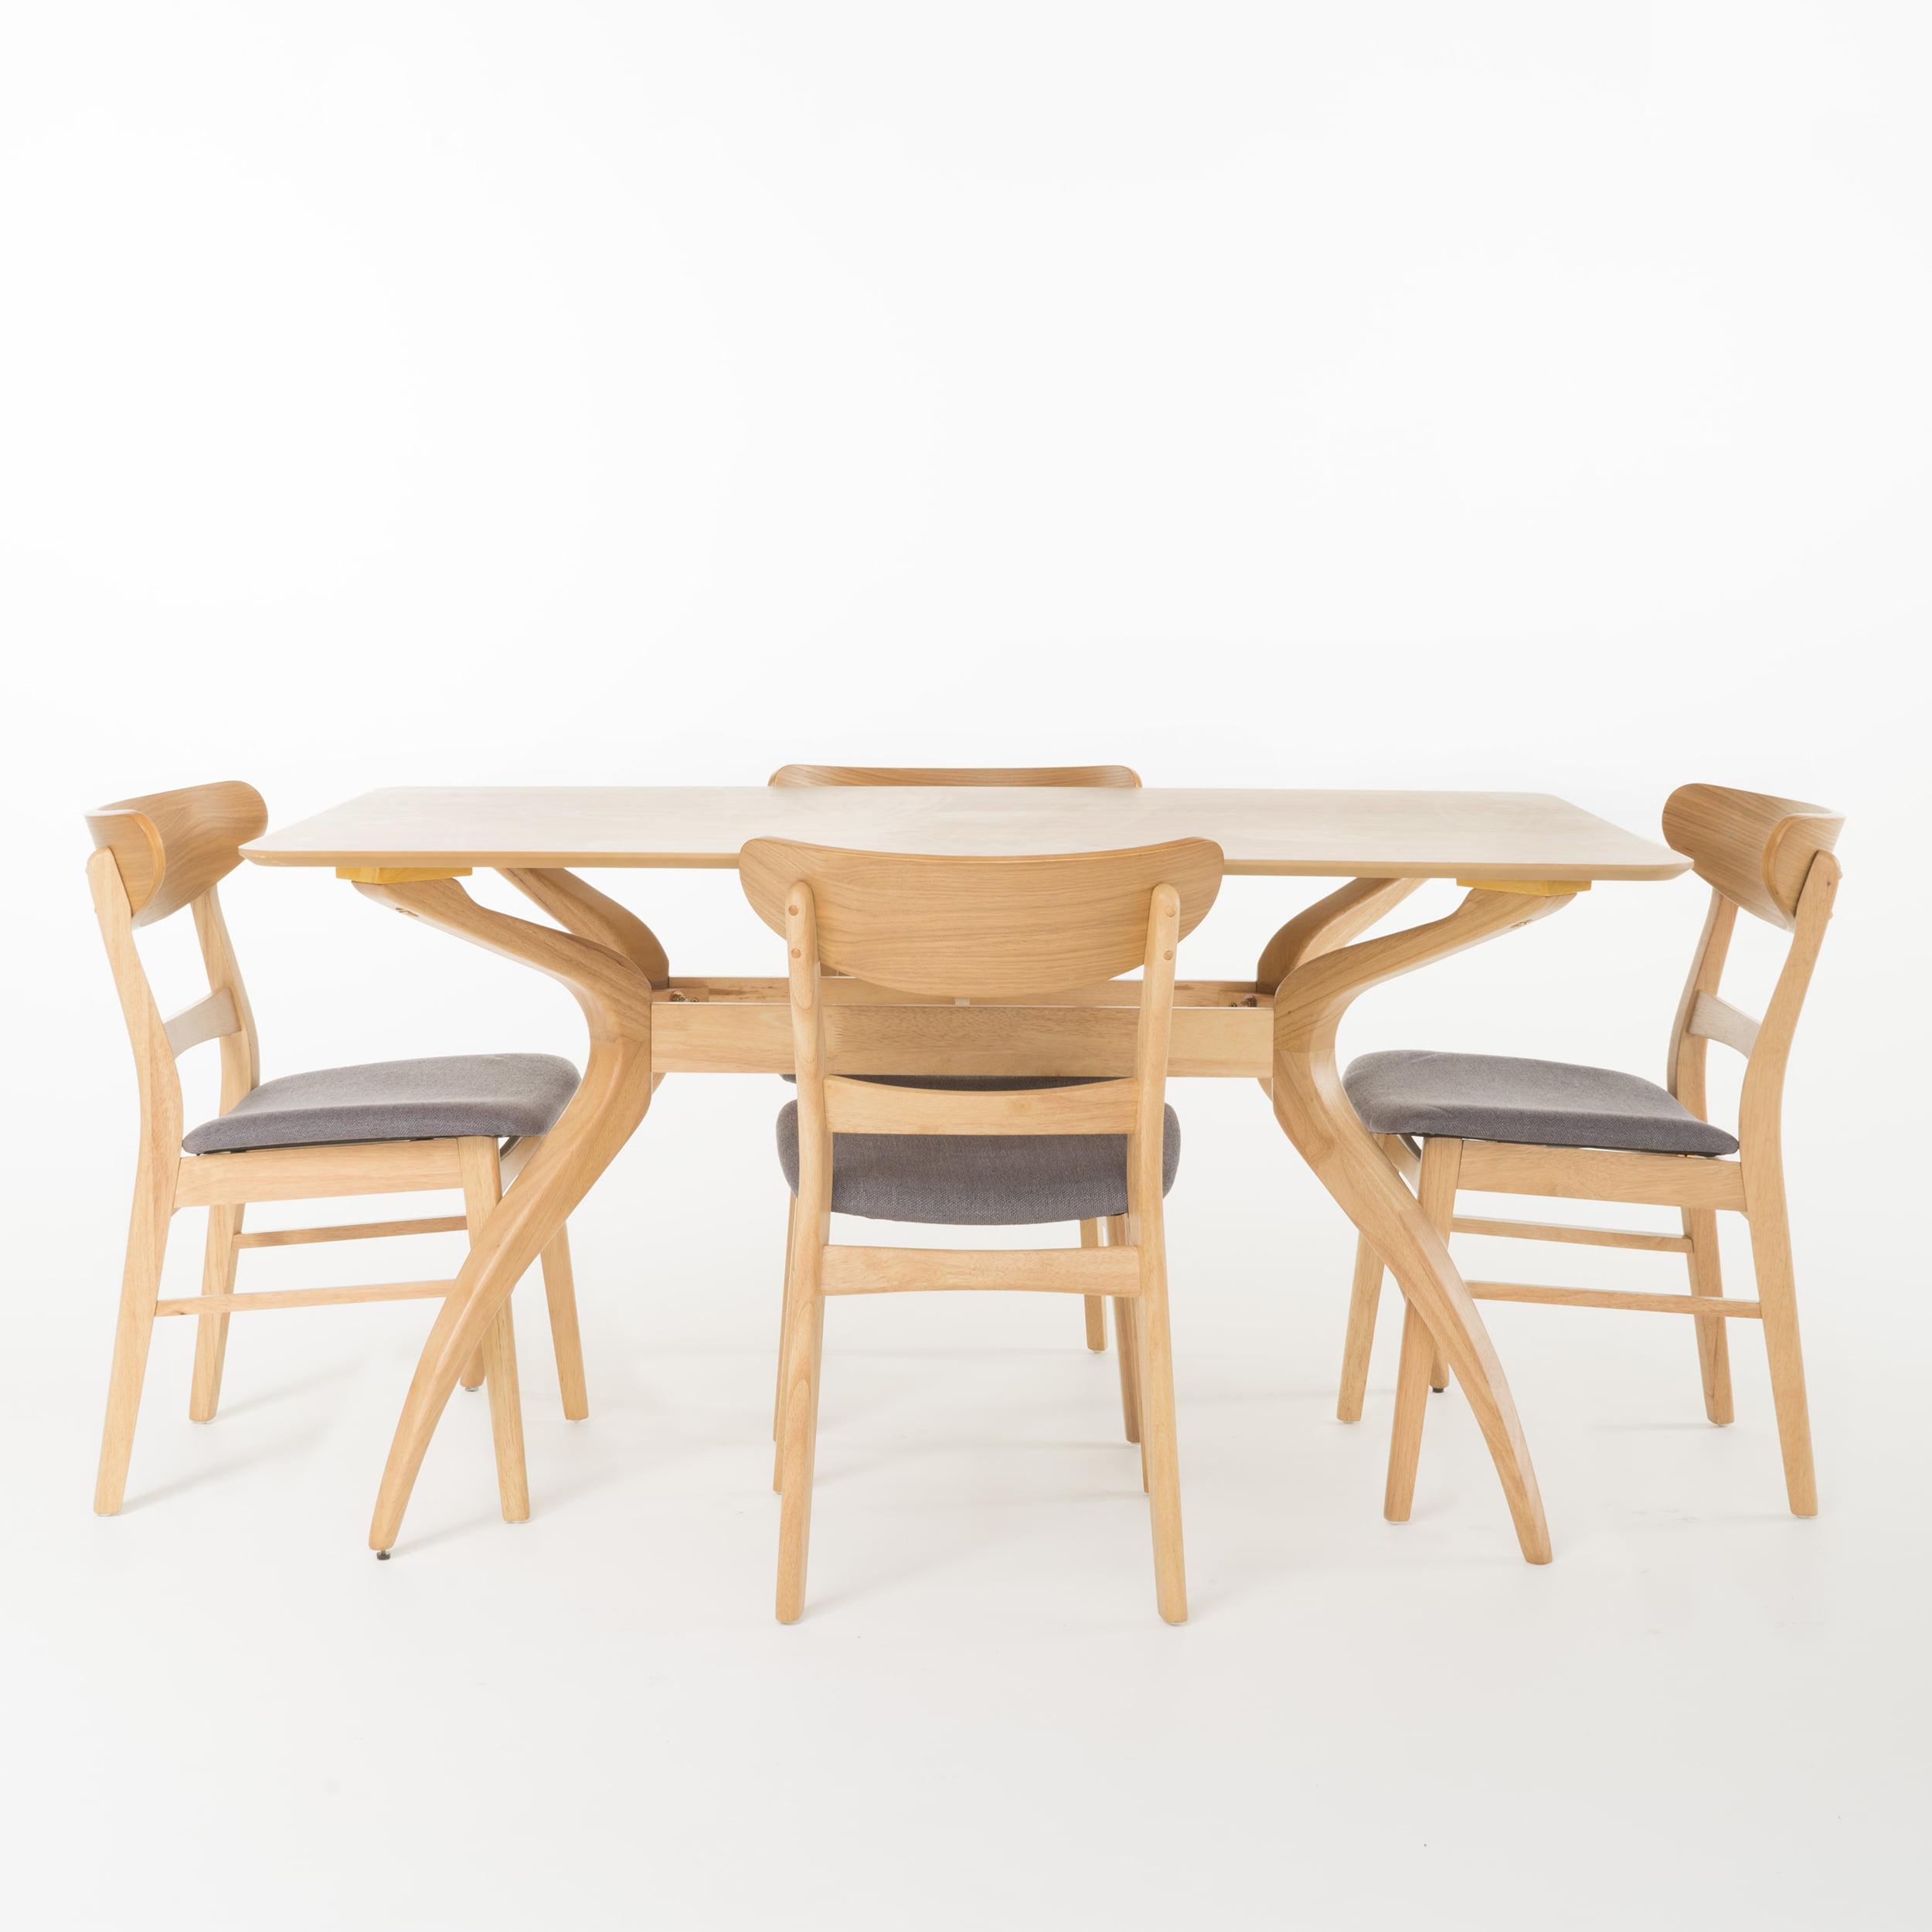 Kloss Curved Leg Rectangular 5-Piece Dining Set, Dark Grey/ Natural Oak Finish